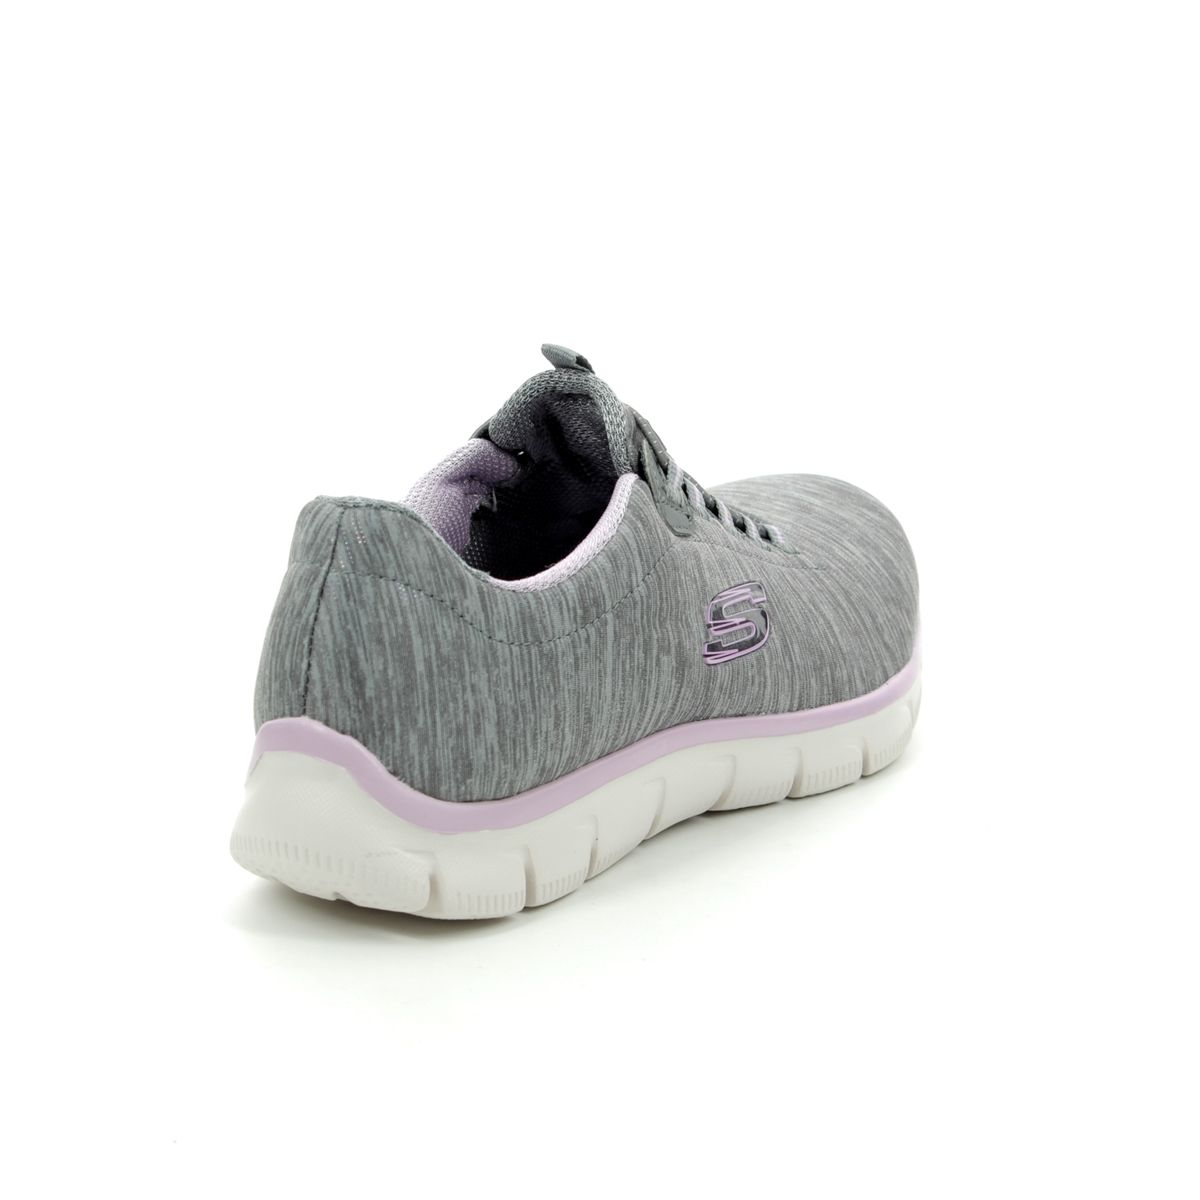 b57e70dc76b Skechers Empire See Ya 12808 GYLV Grey - lavender trainers